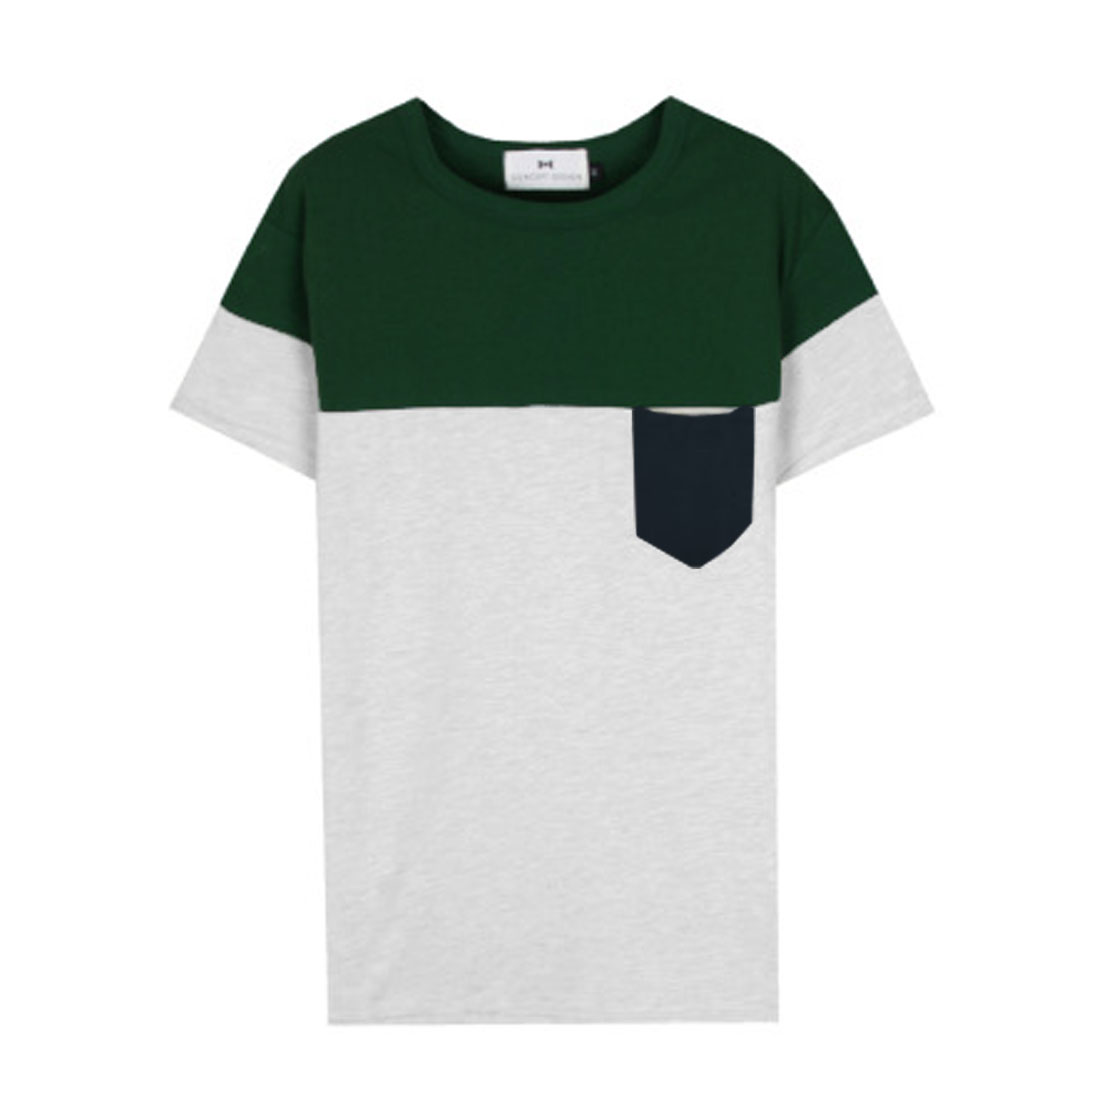 Men Splice Stretchy Stylish Round Neck Leisure Shirt Light Gray Green S